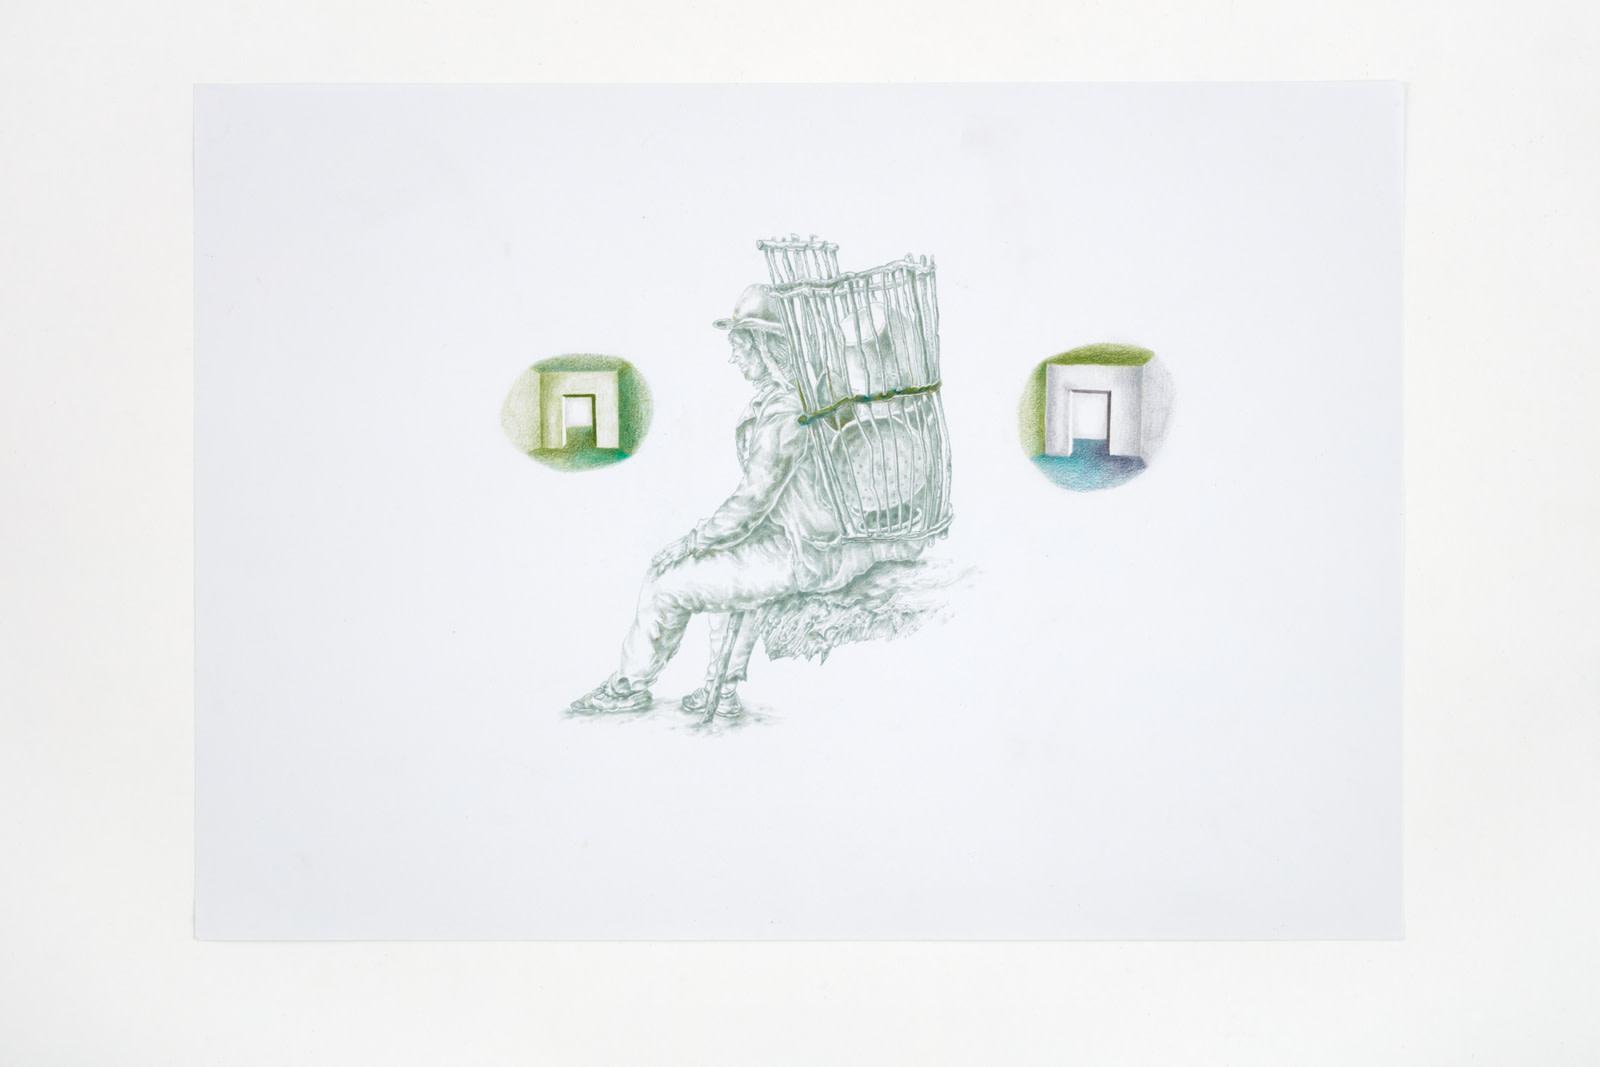 "<div class=""artwork_caption""><div class=""title""><em>Untitled</em>, 2020</div><div class=""medium"">coloured pencil on paper</div><div class=""dimensions"">site size: 30.4 x 45.4 cm / 12 x 17 ⅞ in<br />frame size: 34.1 x 46.4 x 2.5 cm / 13 ⅜ x 18 ¼ x 1 in</div></div><div class=""link""><span class=""website_contact_form"" data-contact-form-details=""Untitled , 2020  coloured pencil on paper  site size: 30.4 x 45.4 cm / 12 x 17 ⅞ in frame size: 34.1 x 46.4 x 2.5 cm / 13 ⅜ x 18 ¼ x 1 in"" data-contact-form-image=""https://artlogic-res.cloudinary.com/w_200,h_200,c_fill,f_auto,fl_lossy/ws-sadiecoles/usr/exhibitions/images/exhibitions/829/hq24-hm16788d-untitled_unframed.jpeg"">Enquire</span></div>"